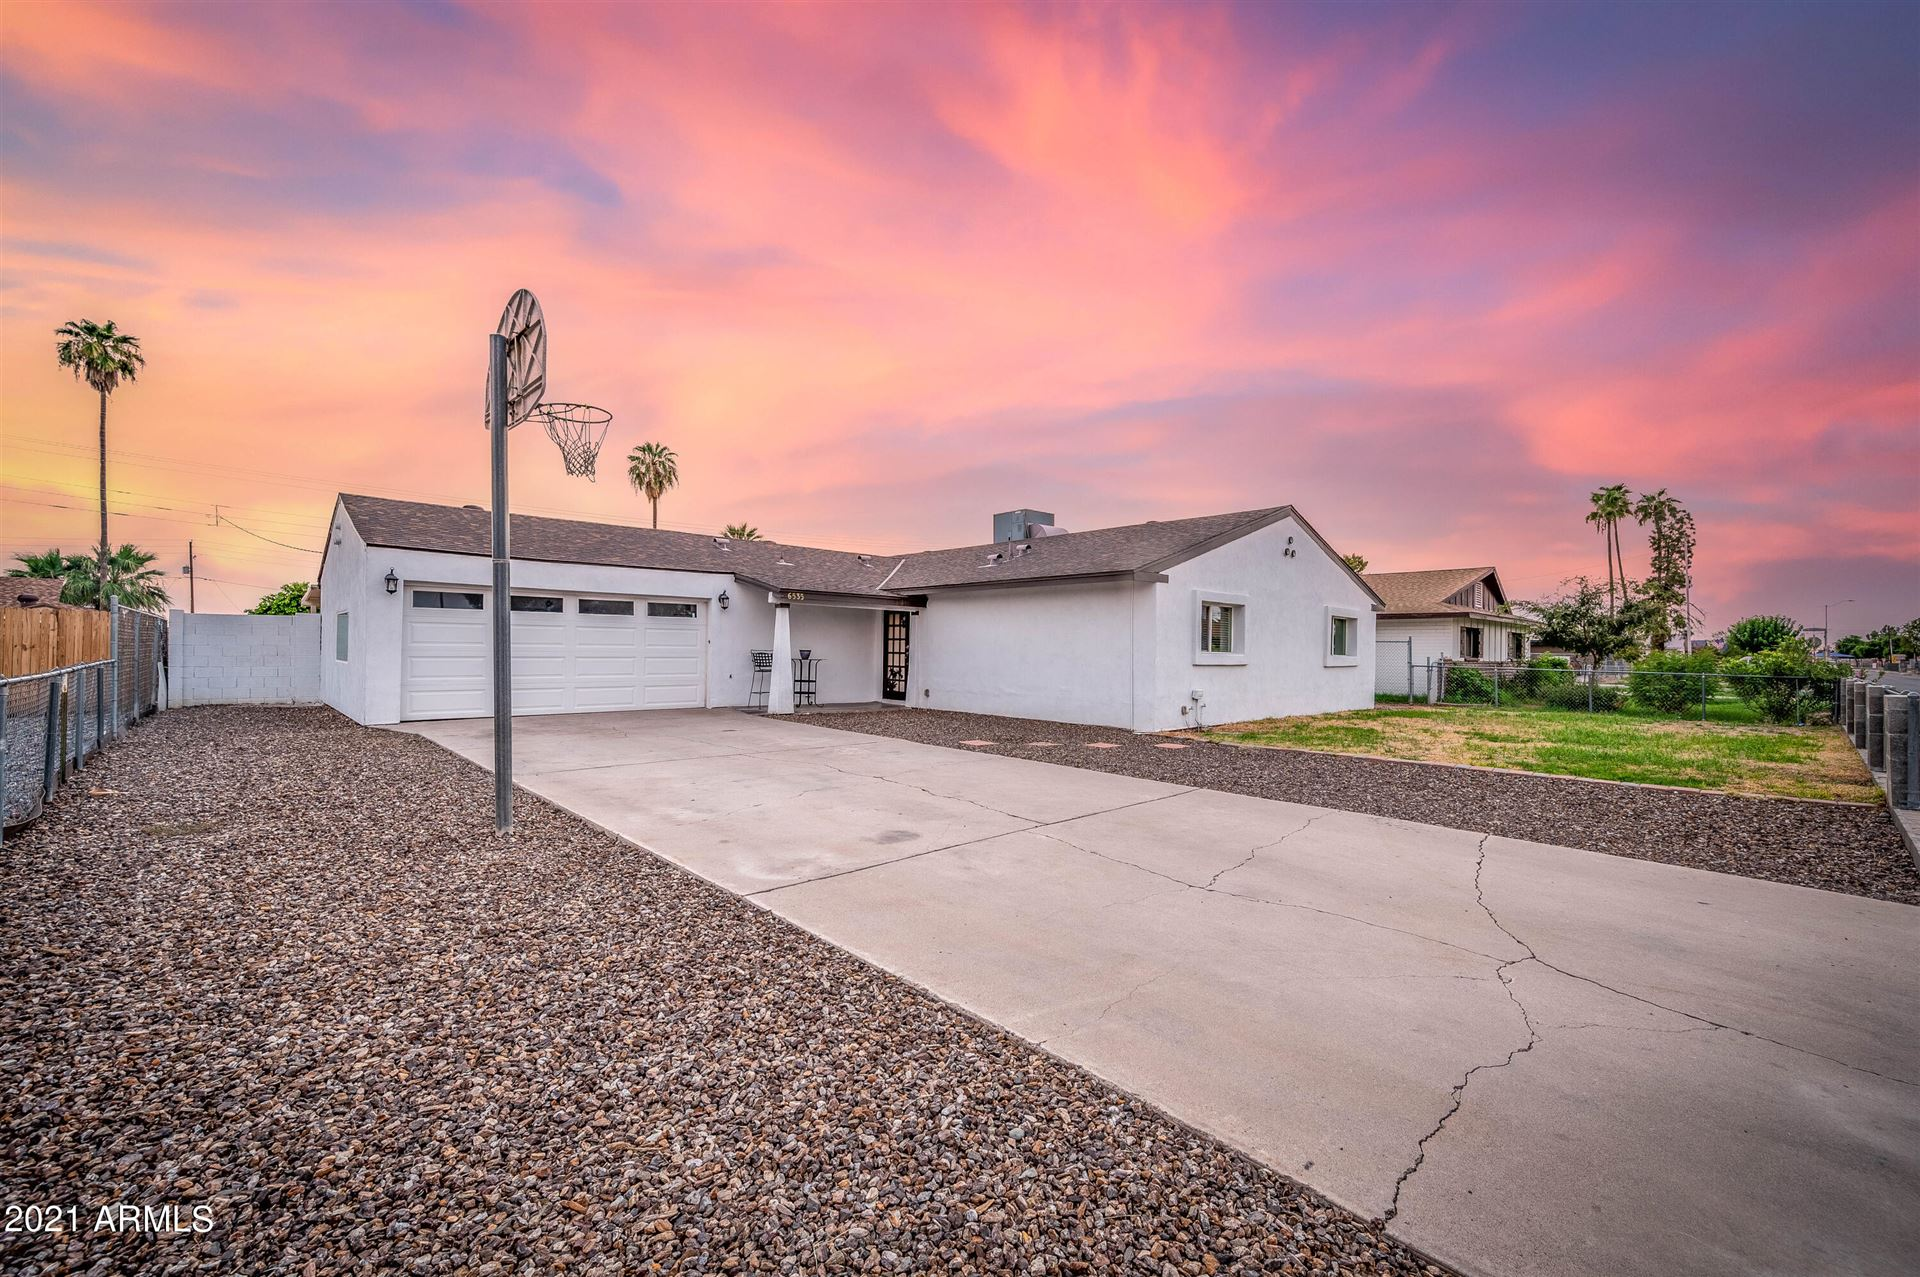 6535 W HEATHERBRAE Drive, Phoenix, AZ 85033 - MLS#: 6285889